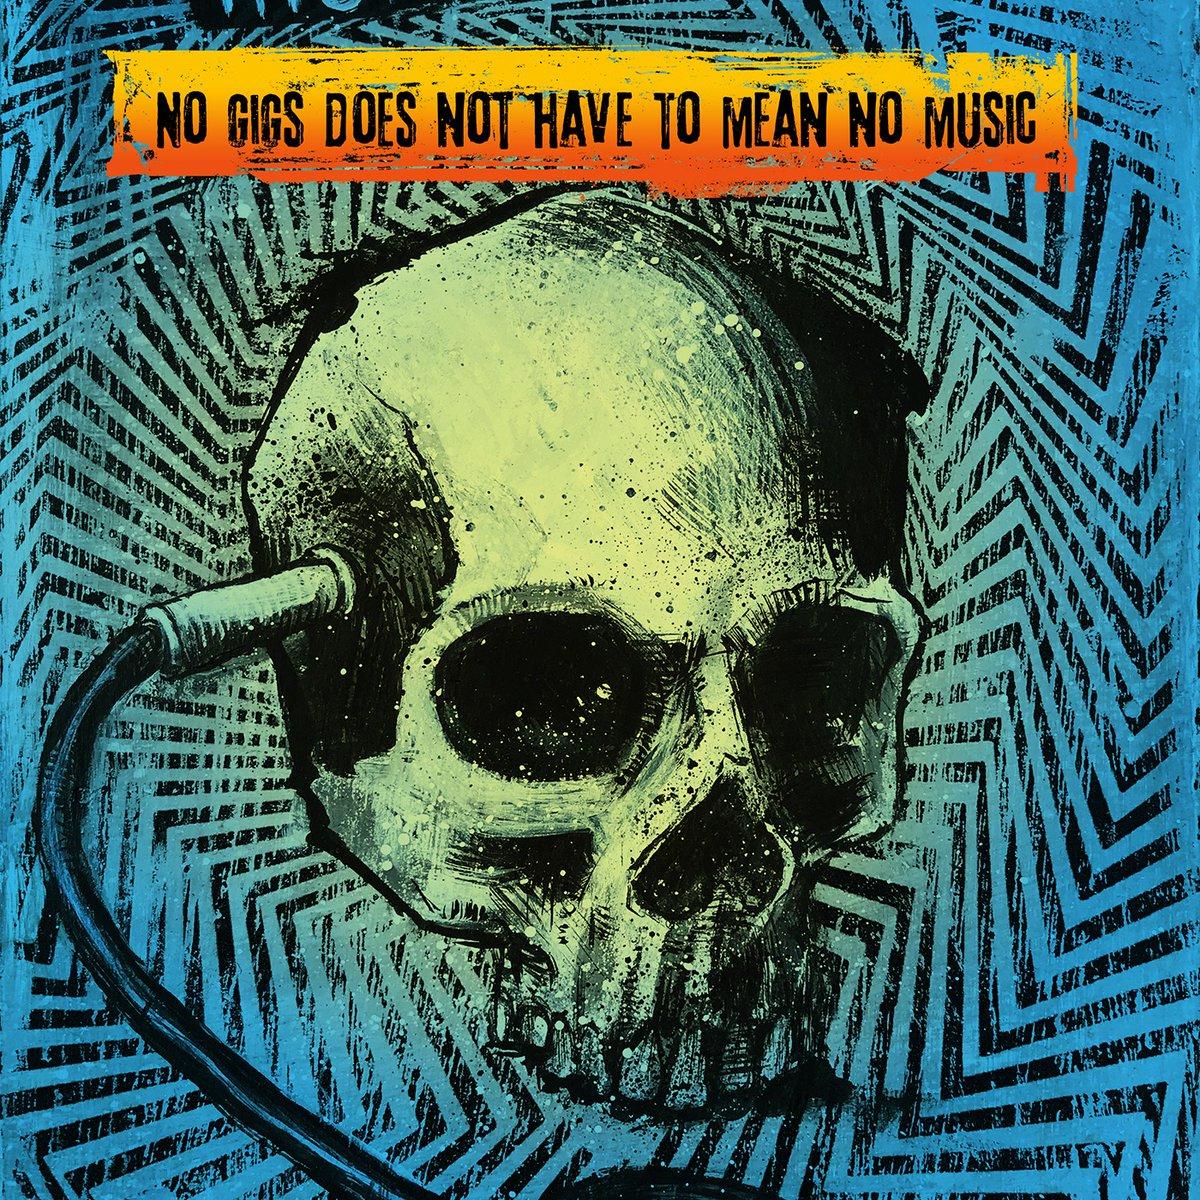 DIGITAL ISOLATION COMPILATION: 200 canciones gratis Vs Coronavirus, via Desert Highways!!! https://bit.ly/3fsBoMr  #psych, #fuzz, #stoner, #grunge, #doom, #sludge, #punk, #hardcore, #grind, #death, #thrash, #heavy, #rock, #acústico, #garage pic.twitter.com/pQgMJOmCMe